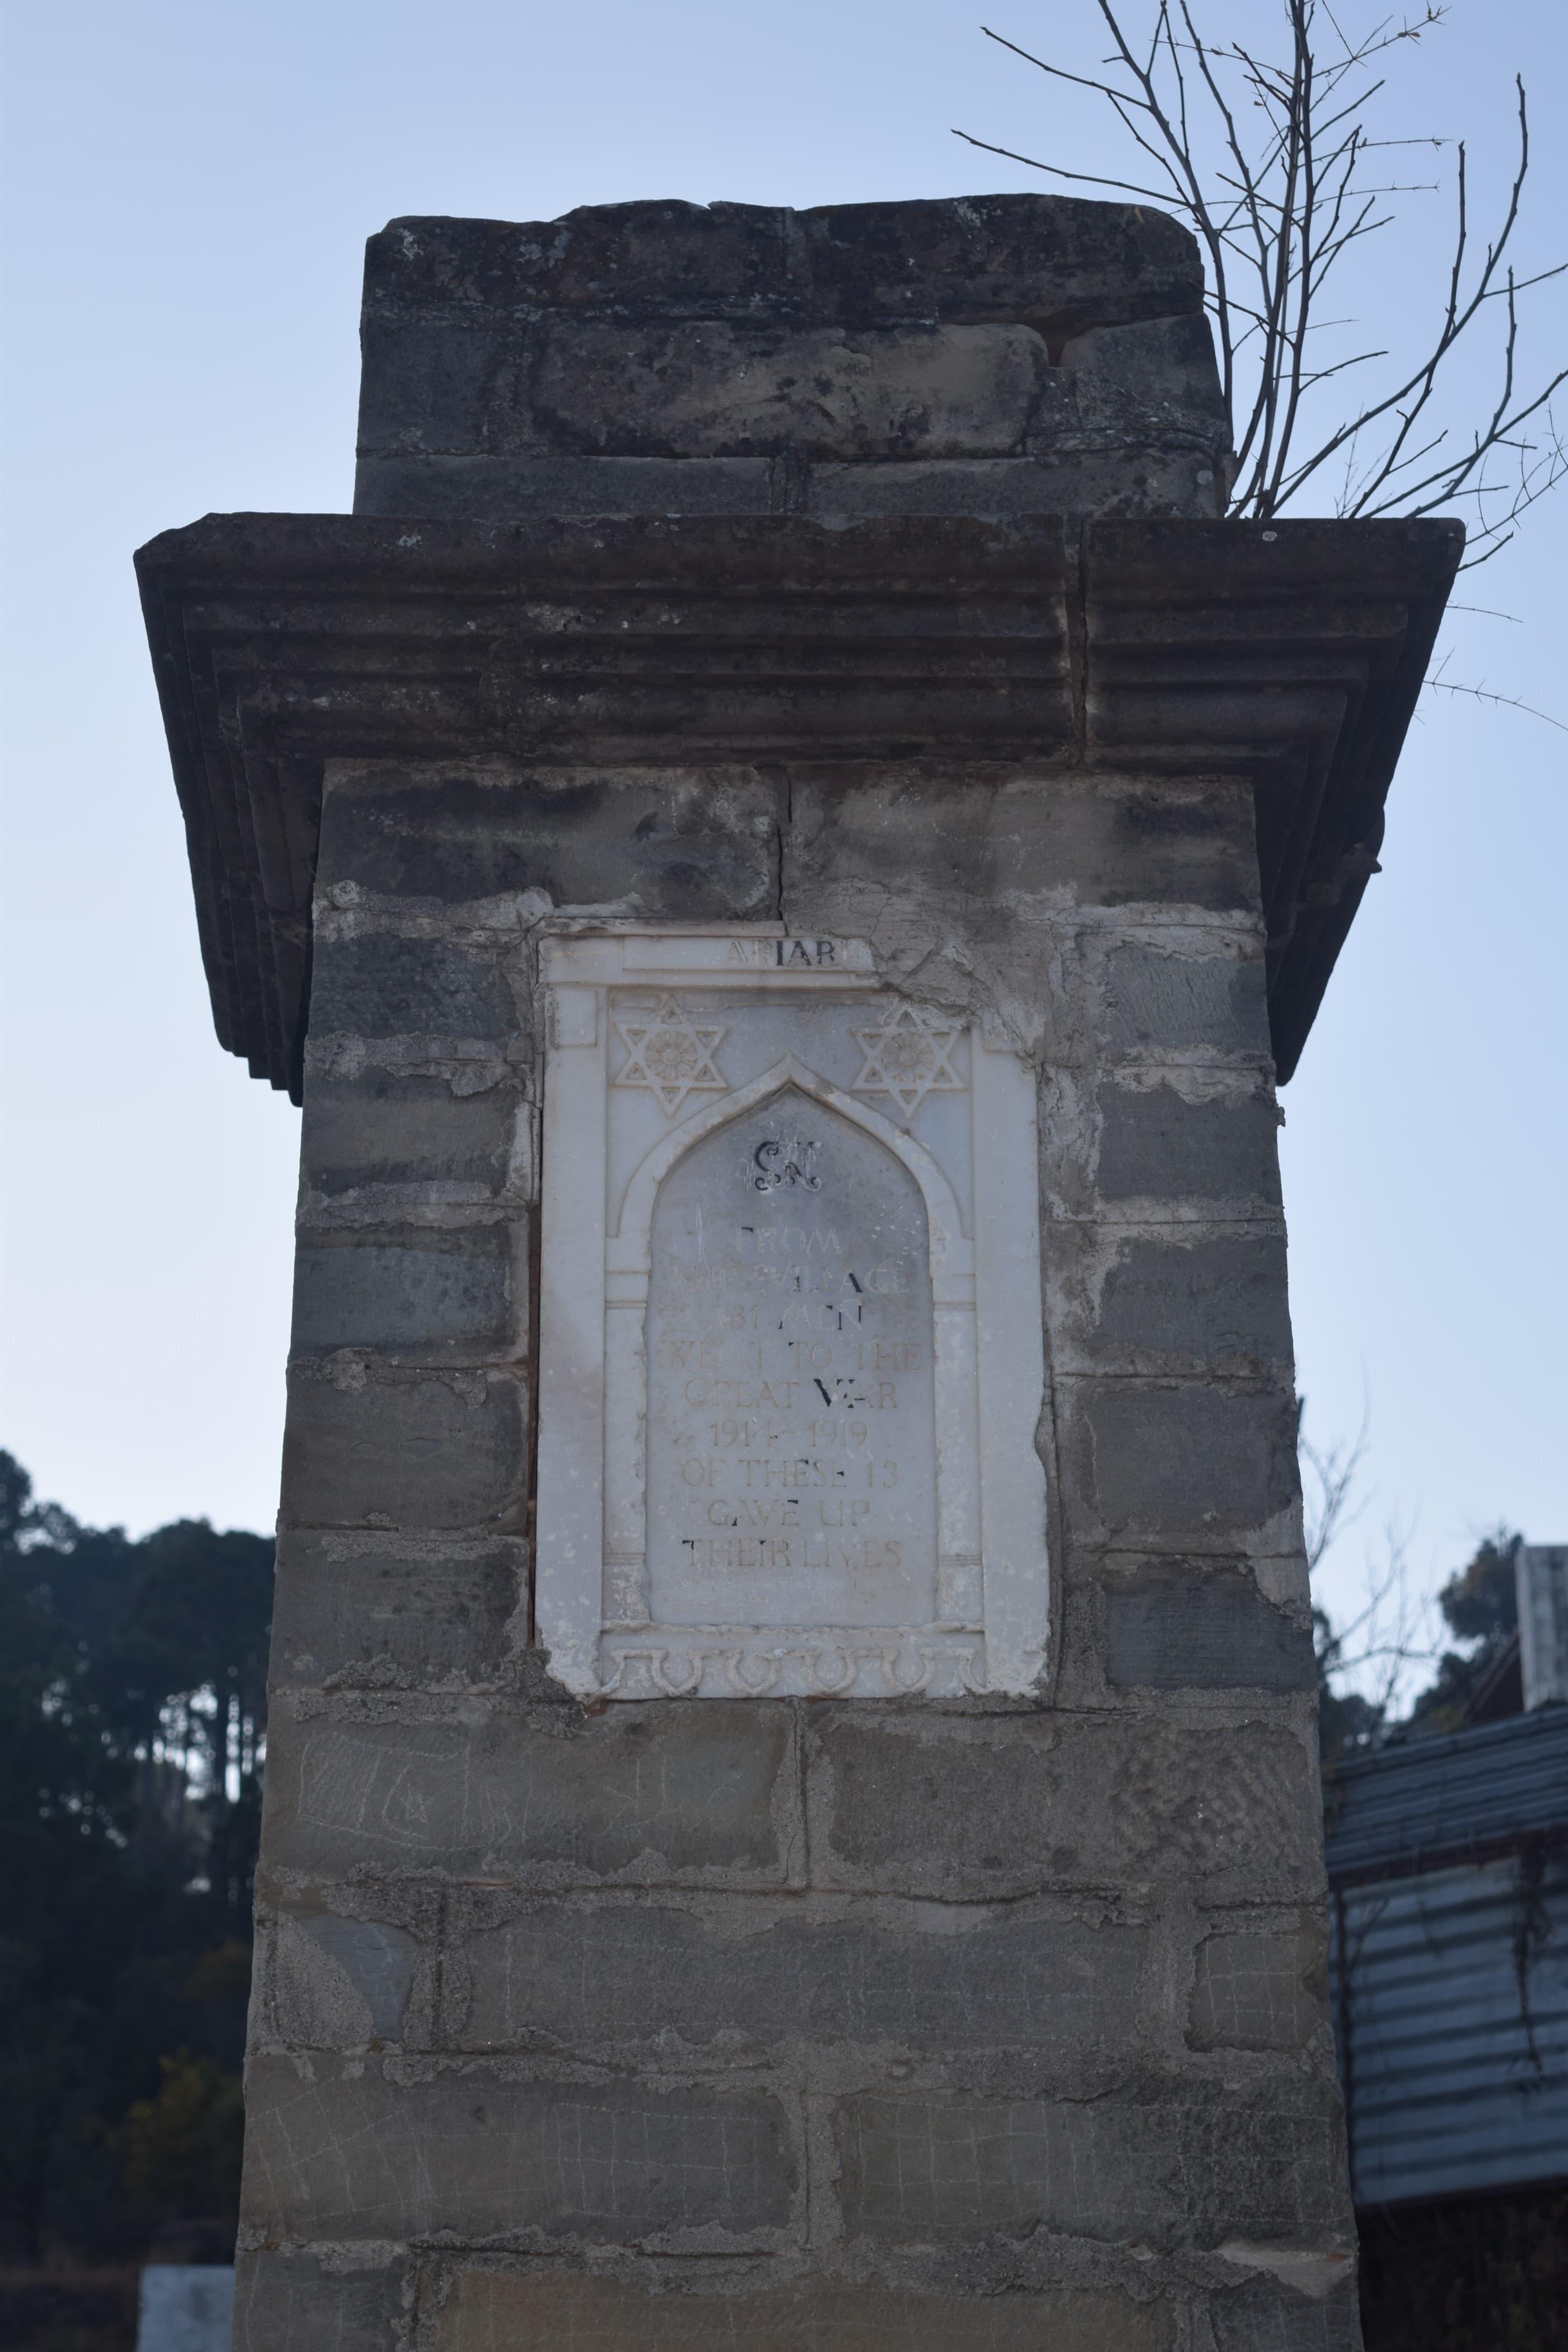 The World War I memorial at Ariari.